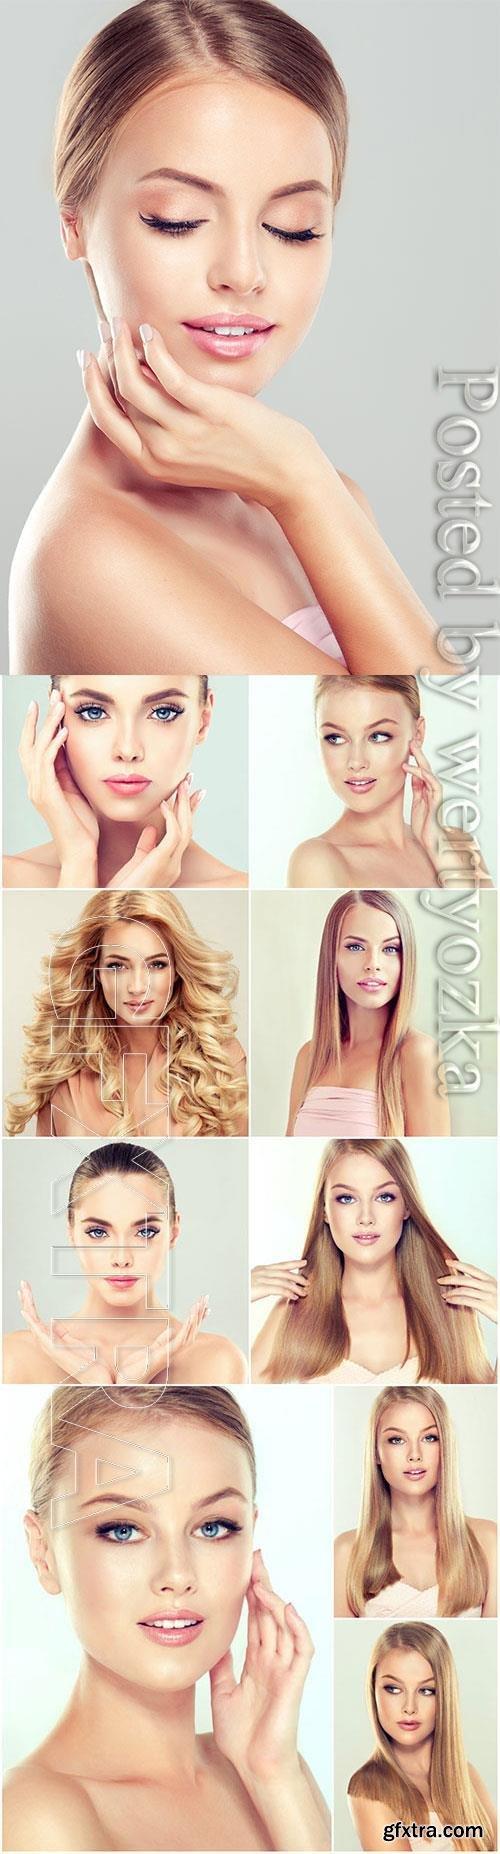 Well-groomed pretty girls stock photo